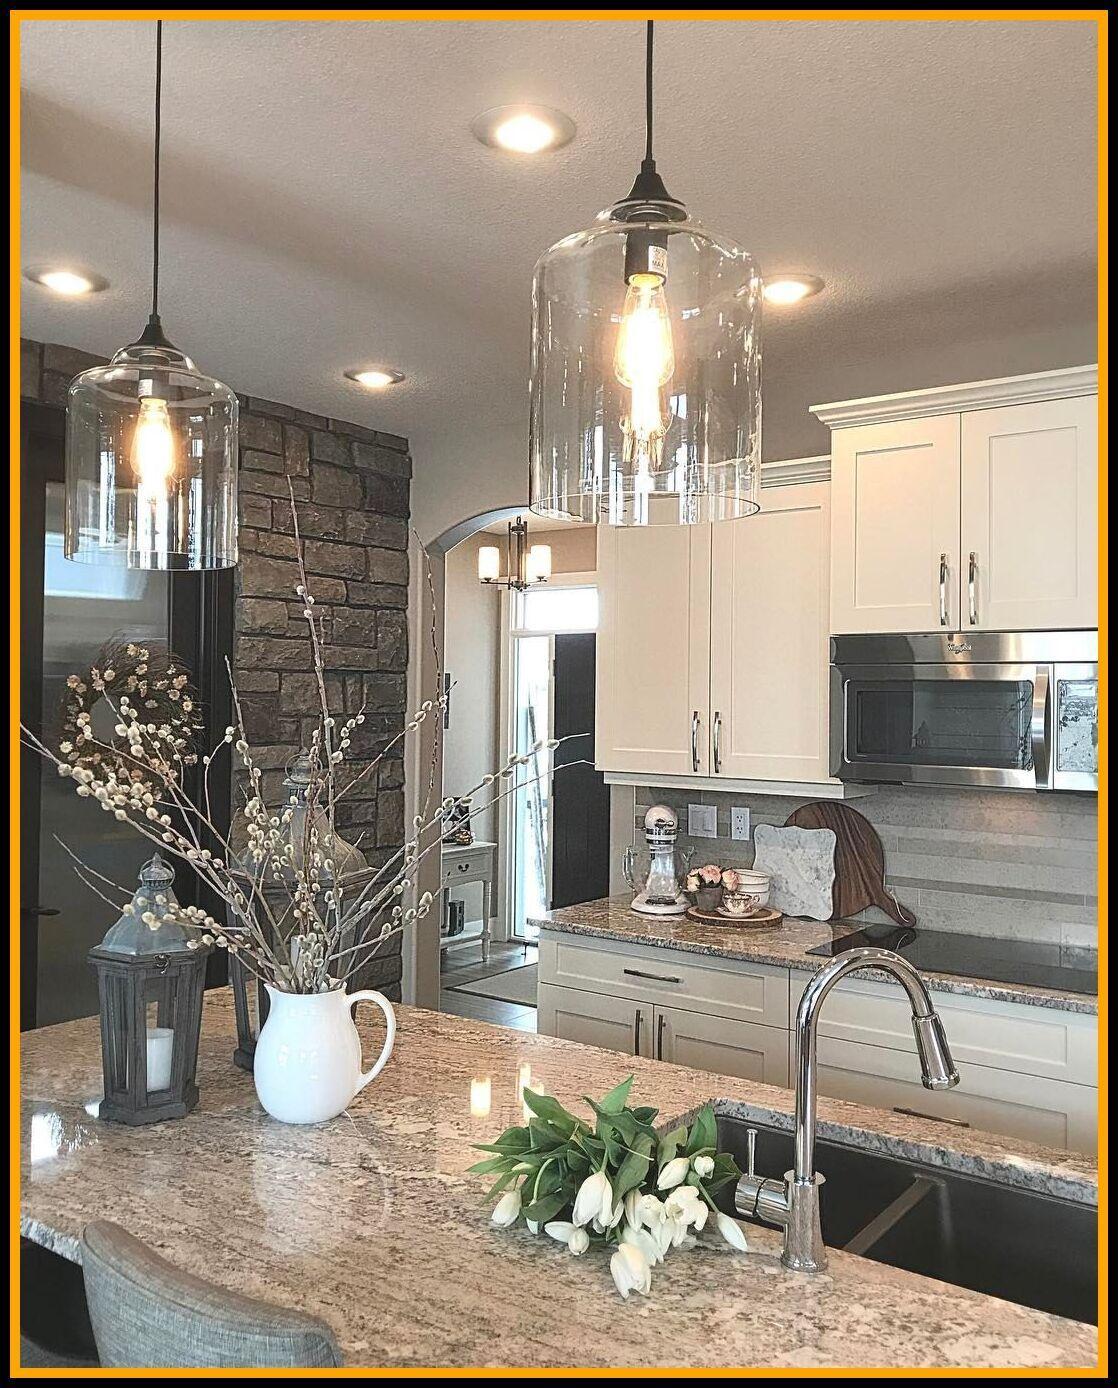 46 Reference Of Modern Hanging Kitchen Light Fixtures Fixtures Hanging Kitchen Kitchen Lighting Fixtures Ceiling Rustic Light Fixtures Best Kitchen Lighting